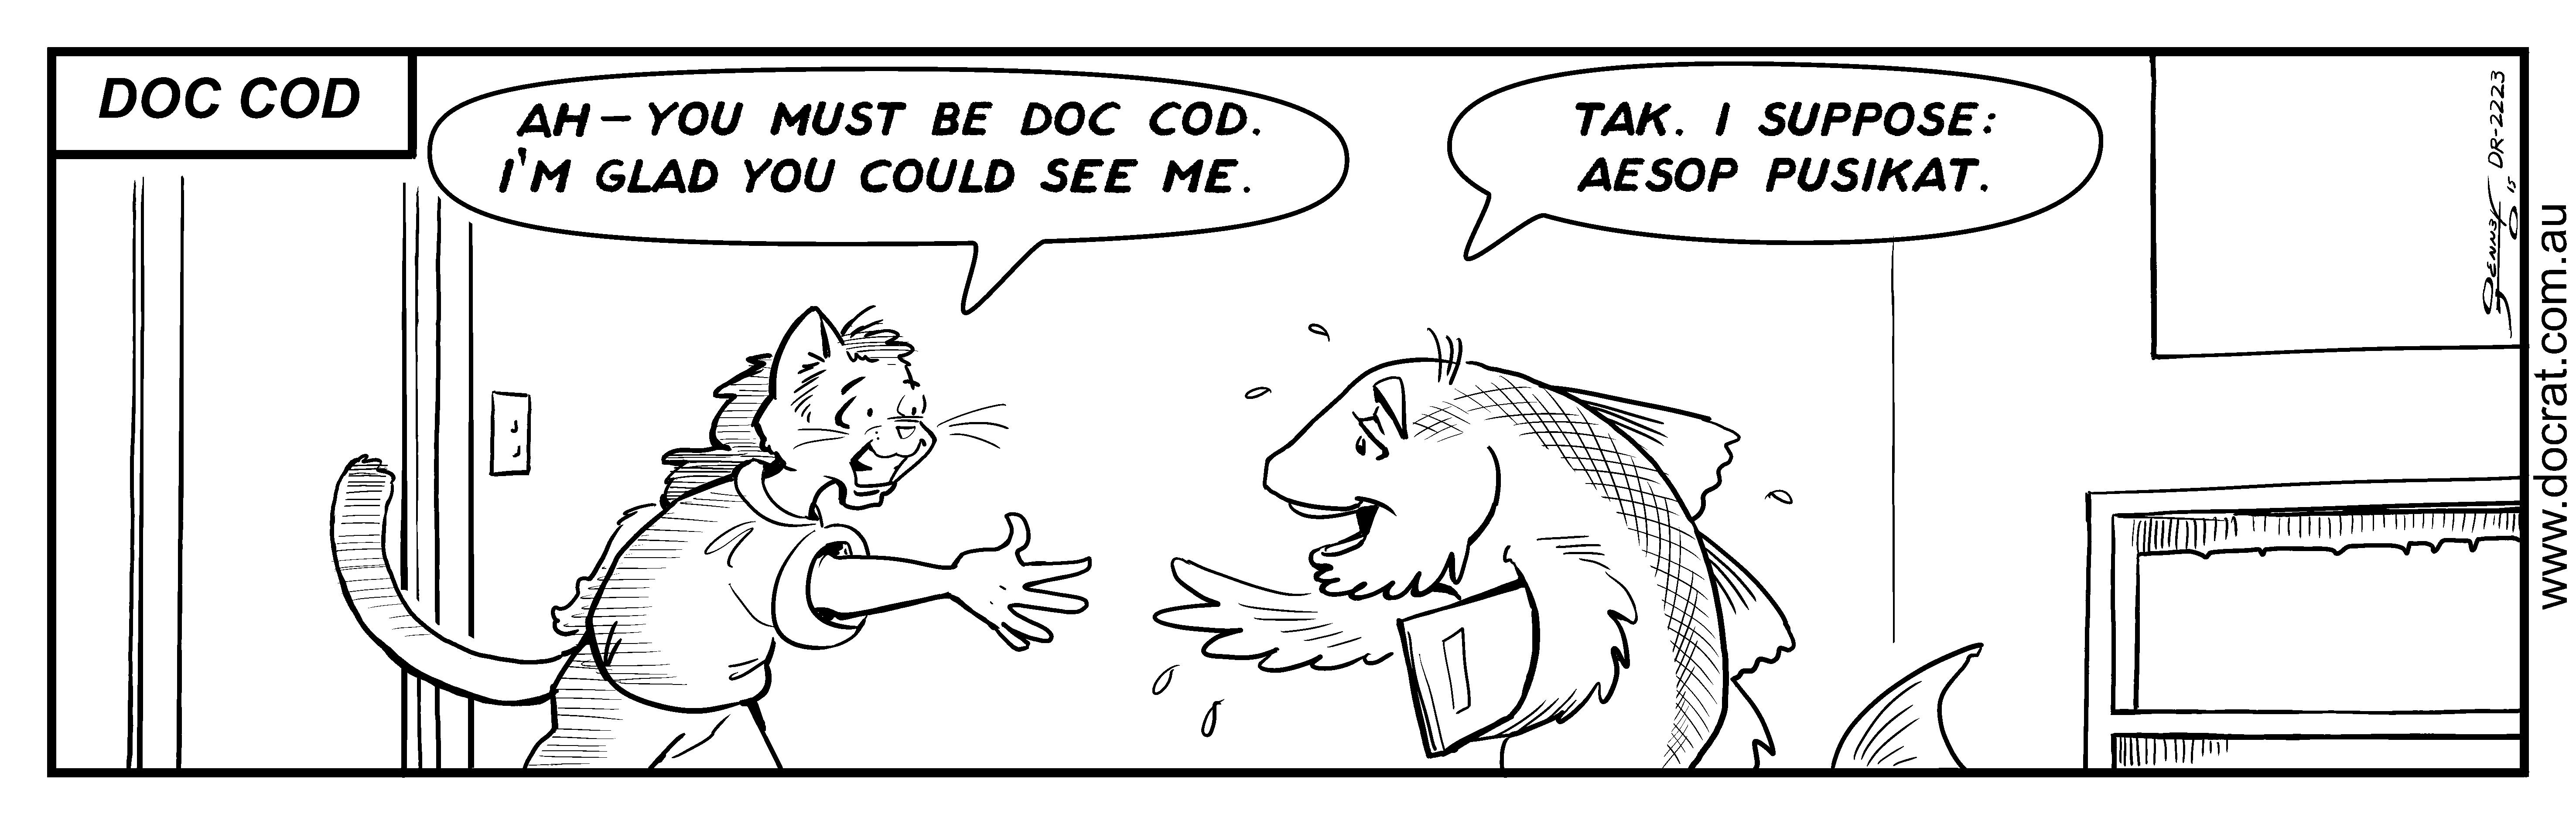 20150304